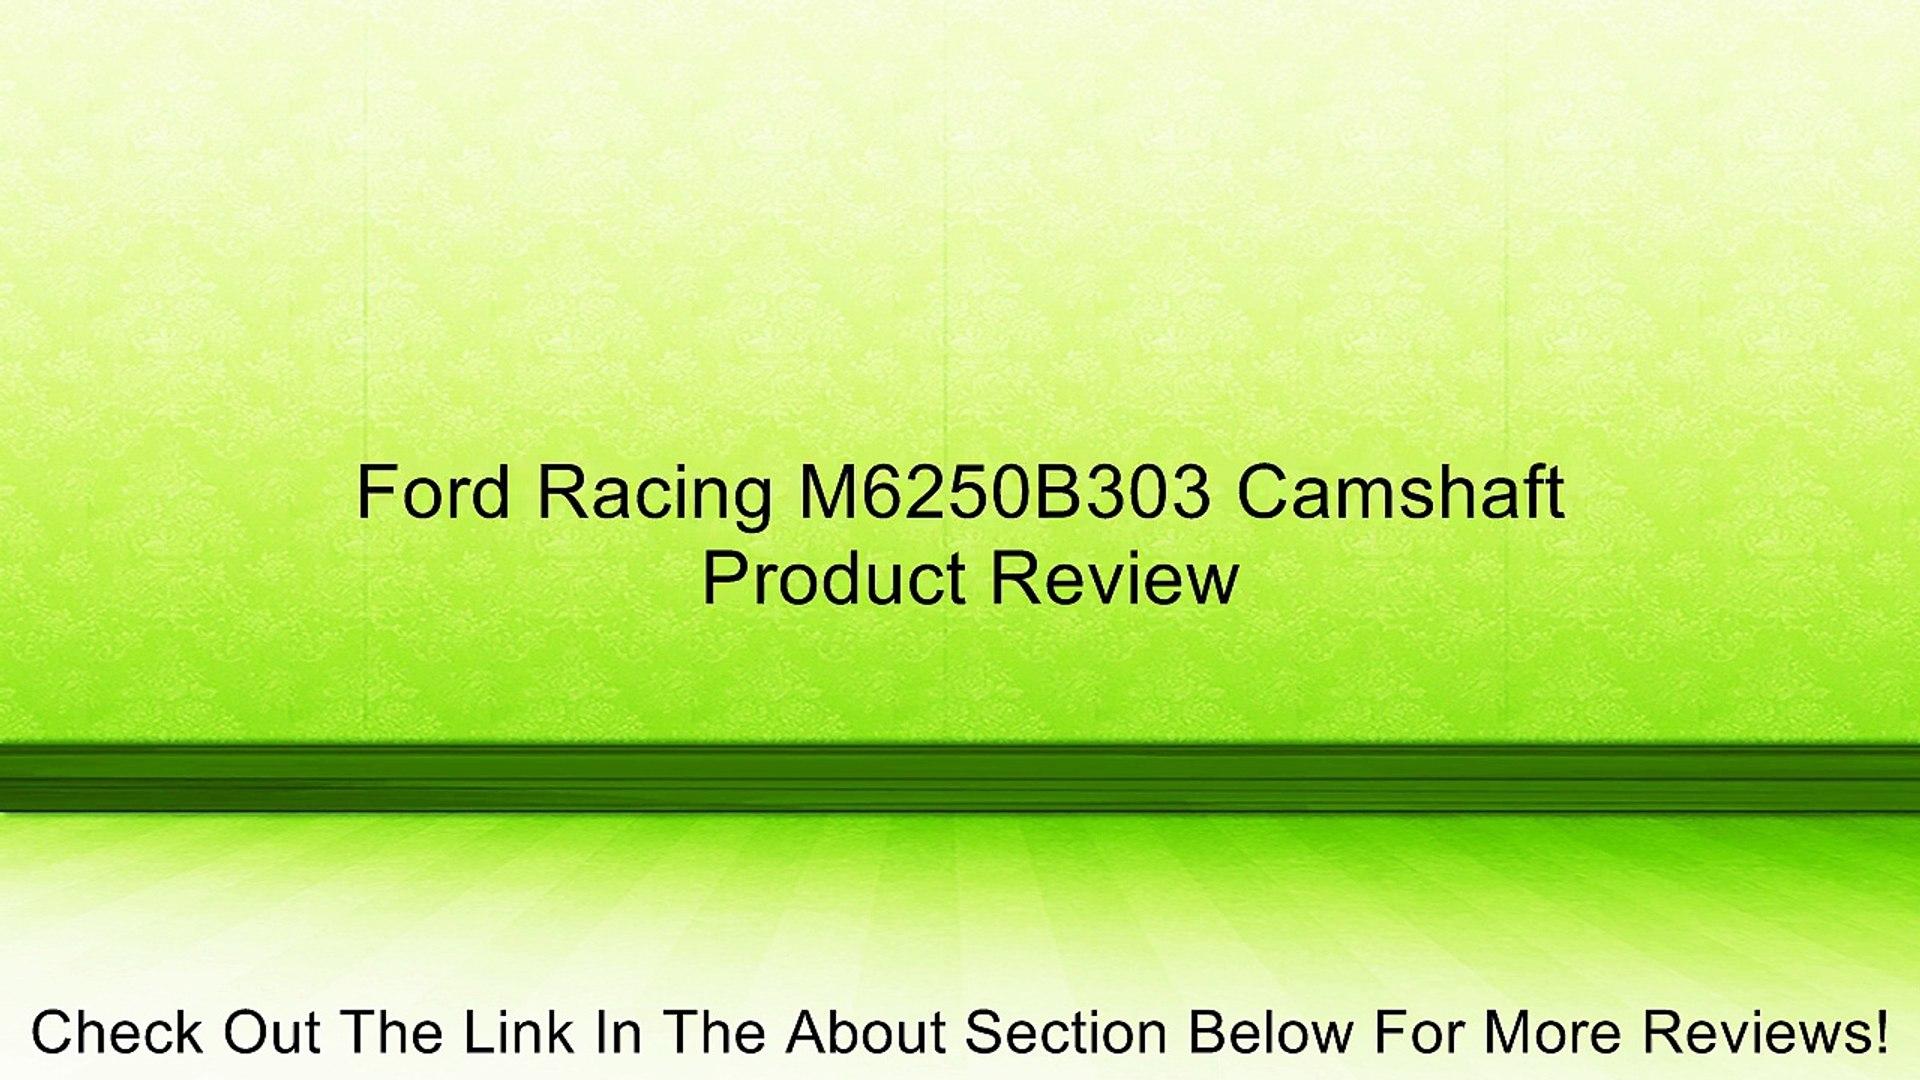 Ford Racing M6250B303 Camshaft